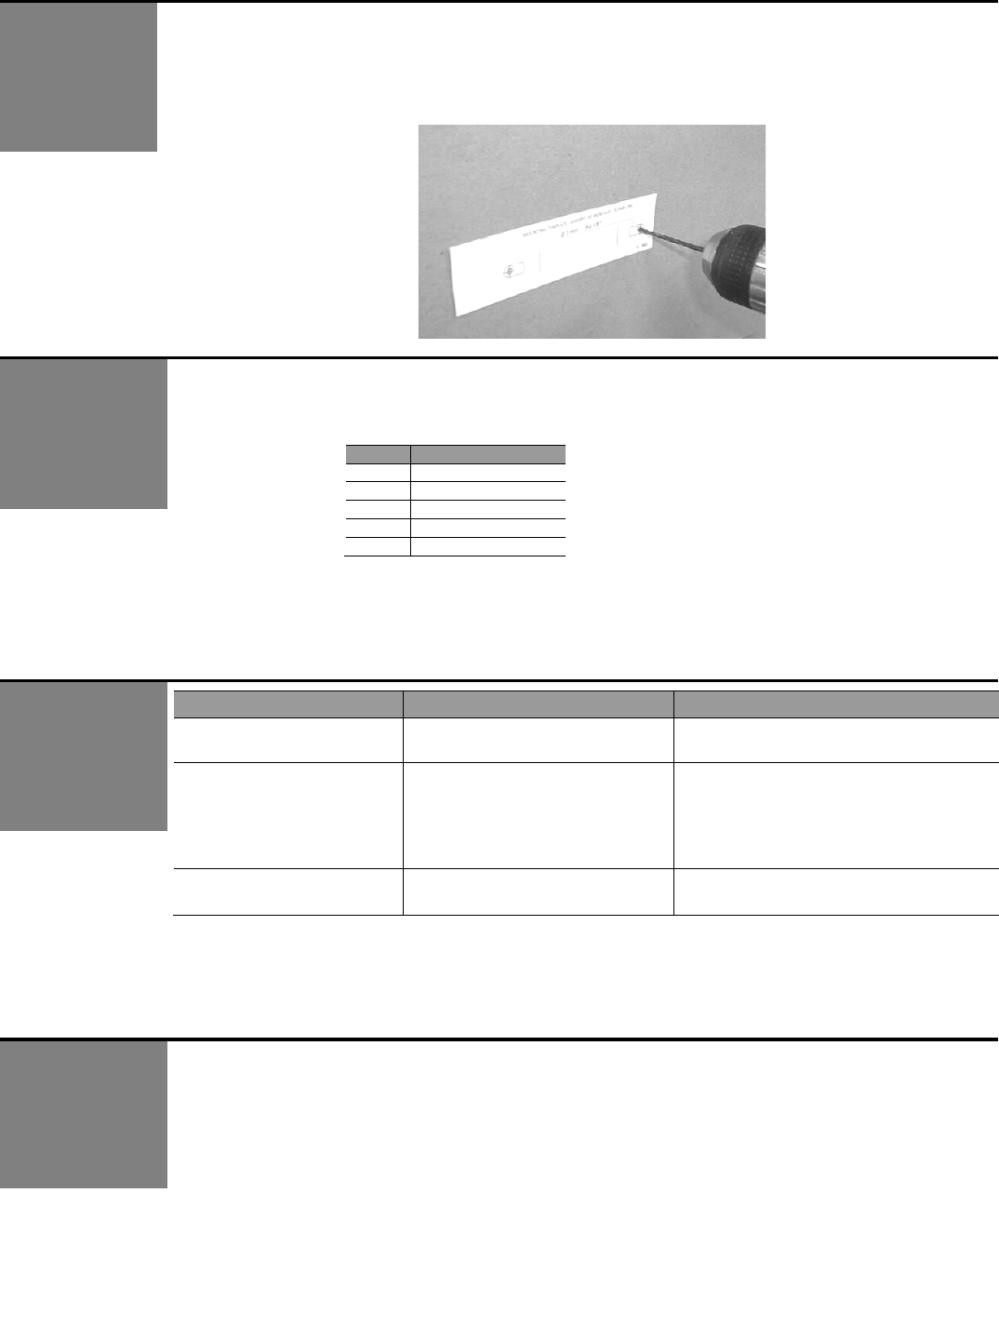 medium resolution of bea maglock wiring diagram wiring diagrams schematics bea 10rd433 433 mhz digital nissan frontier stereo wiring